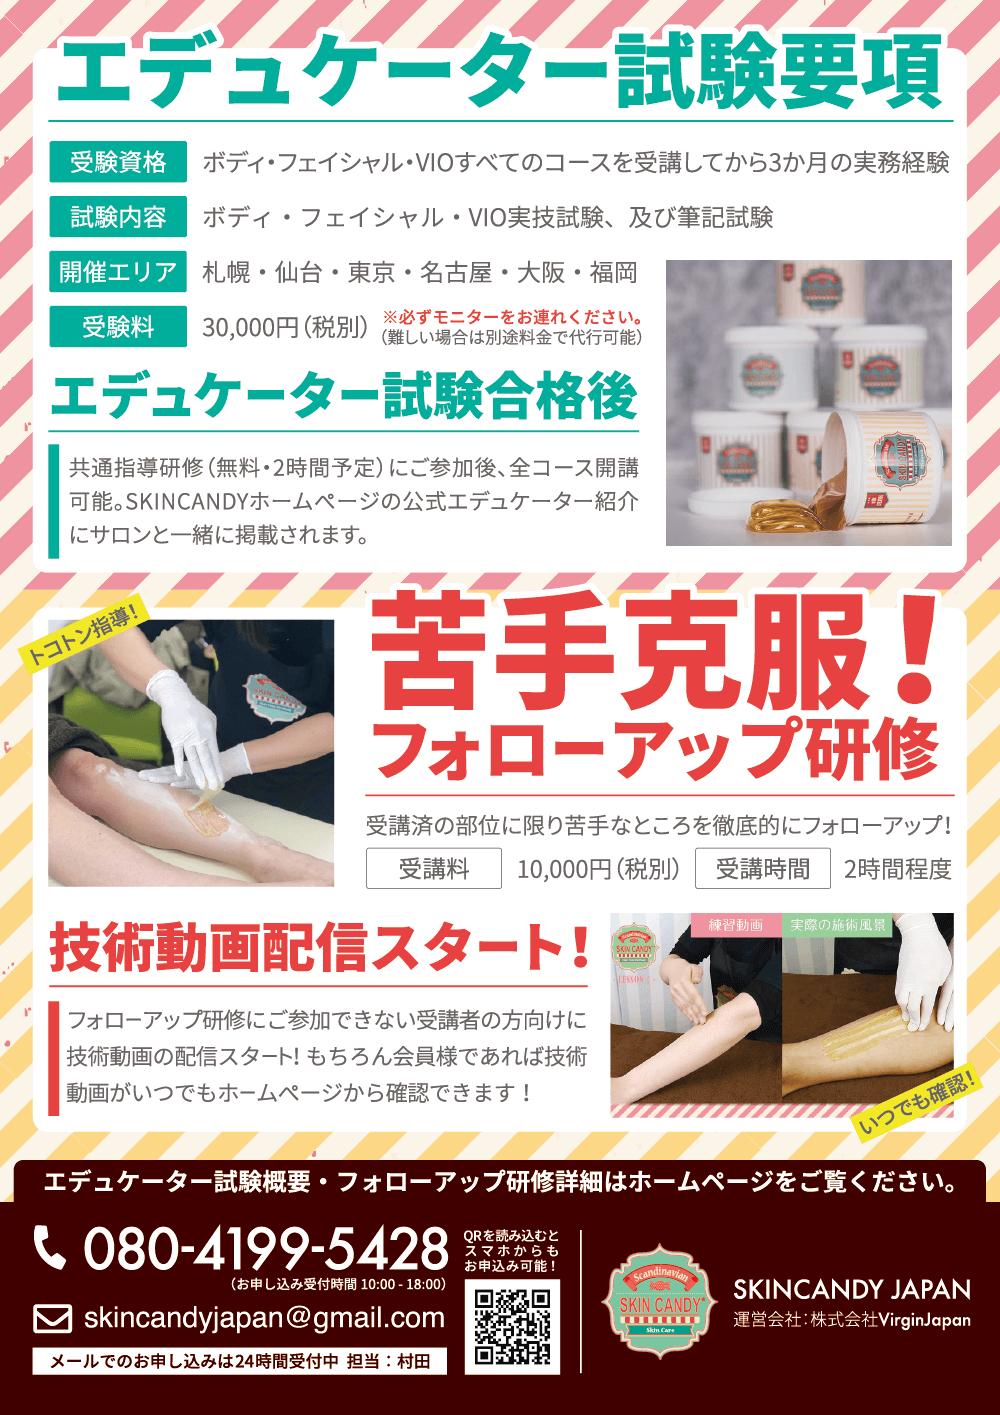 SKIN CANDY スキンキャンディ エデュケーター制度002